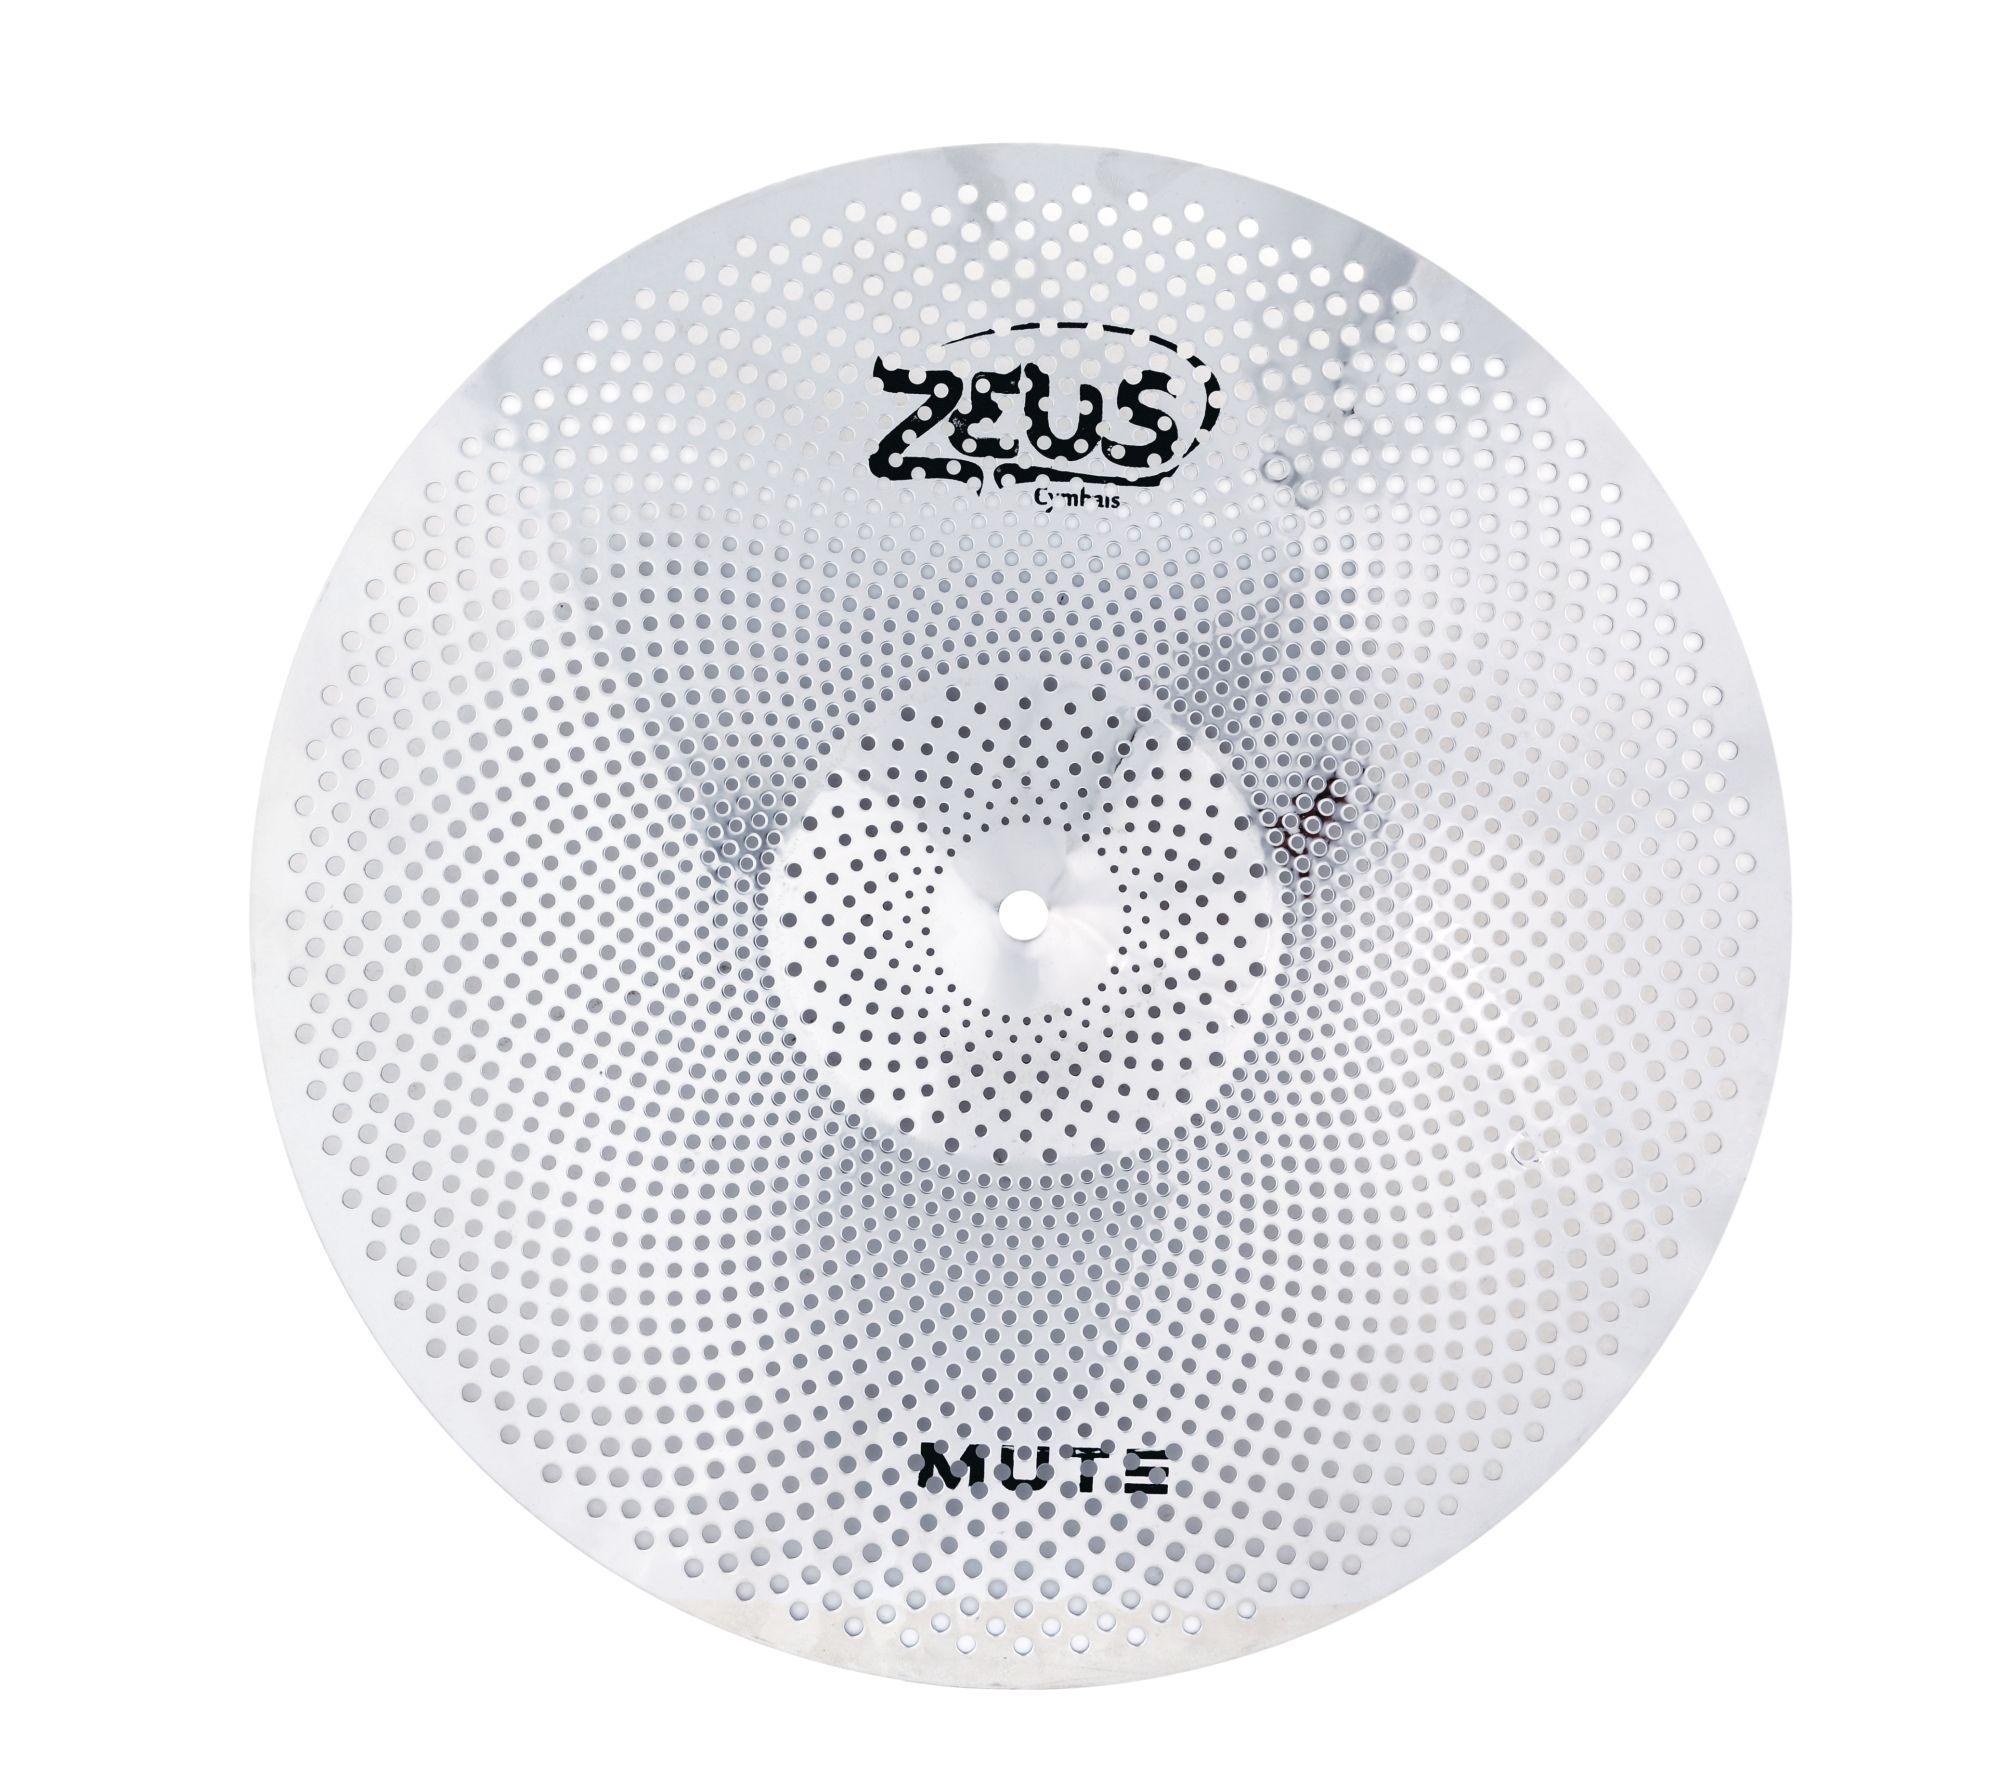 Prato Zeus Mute Crash 17 Zmc17